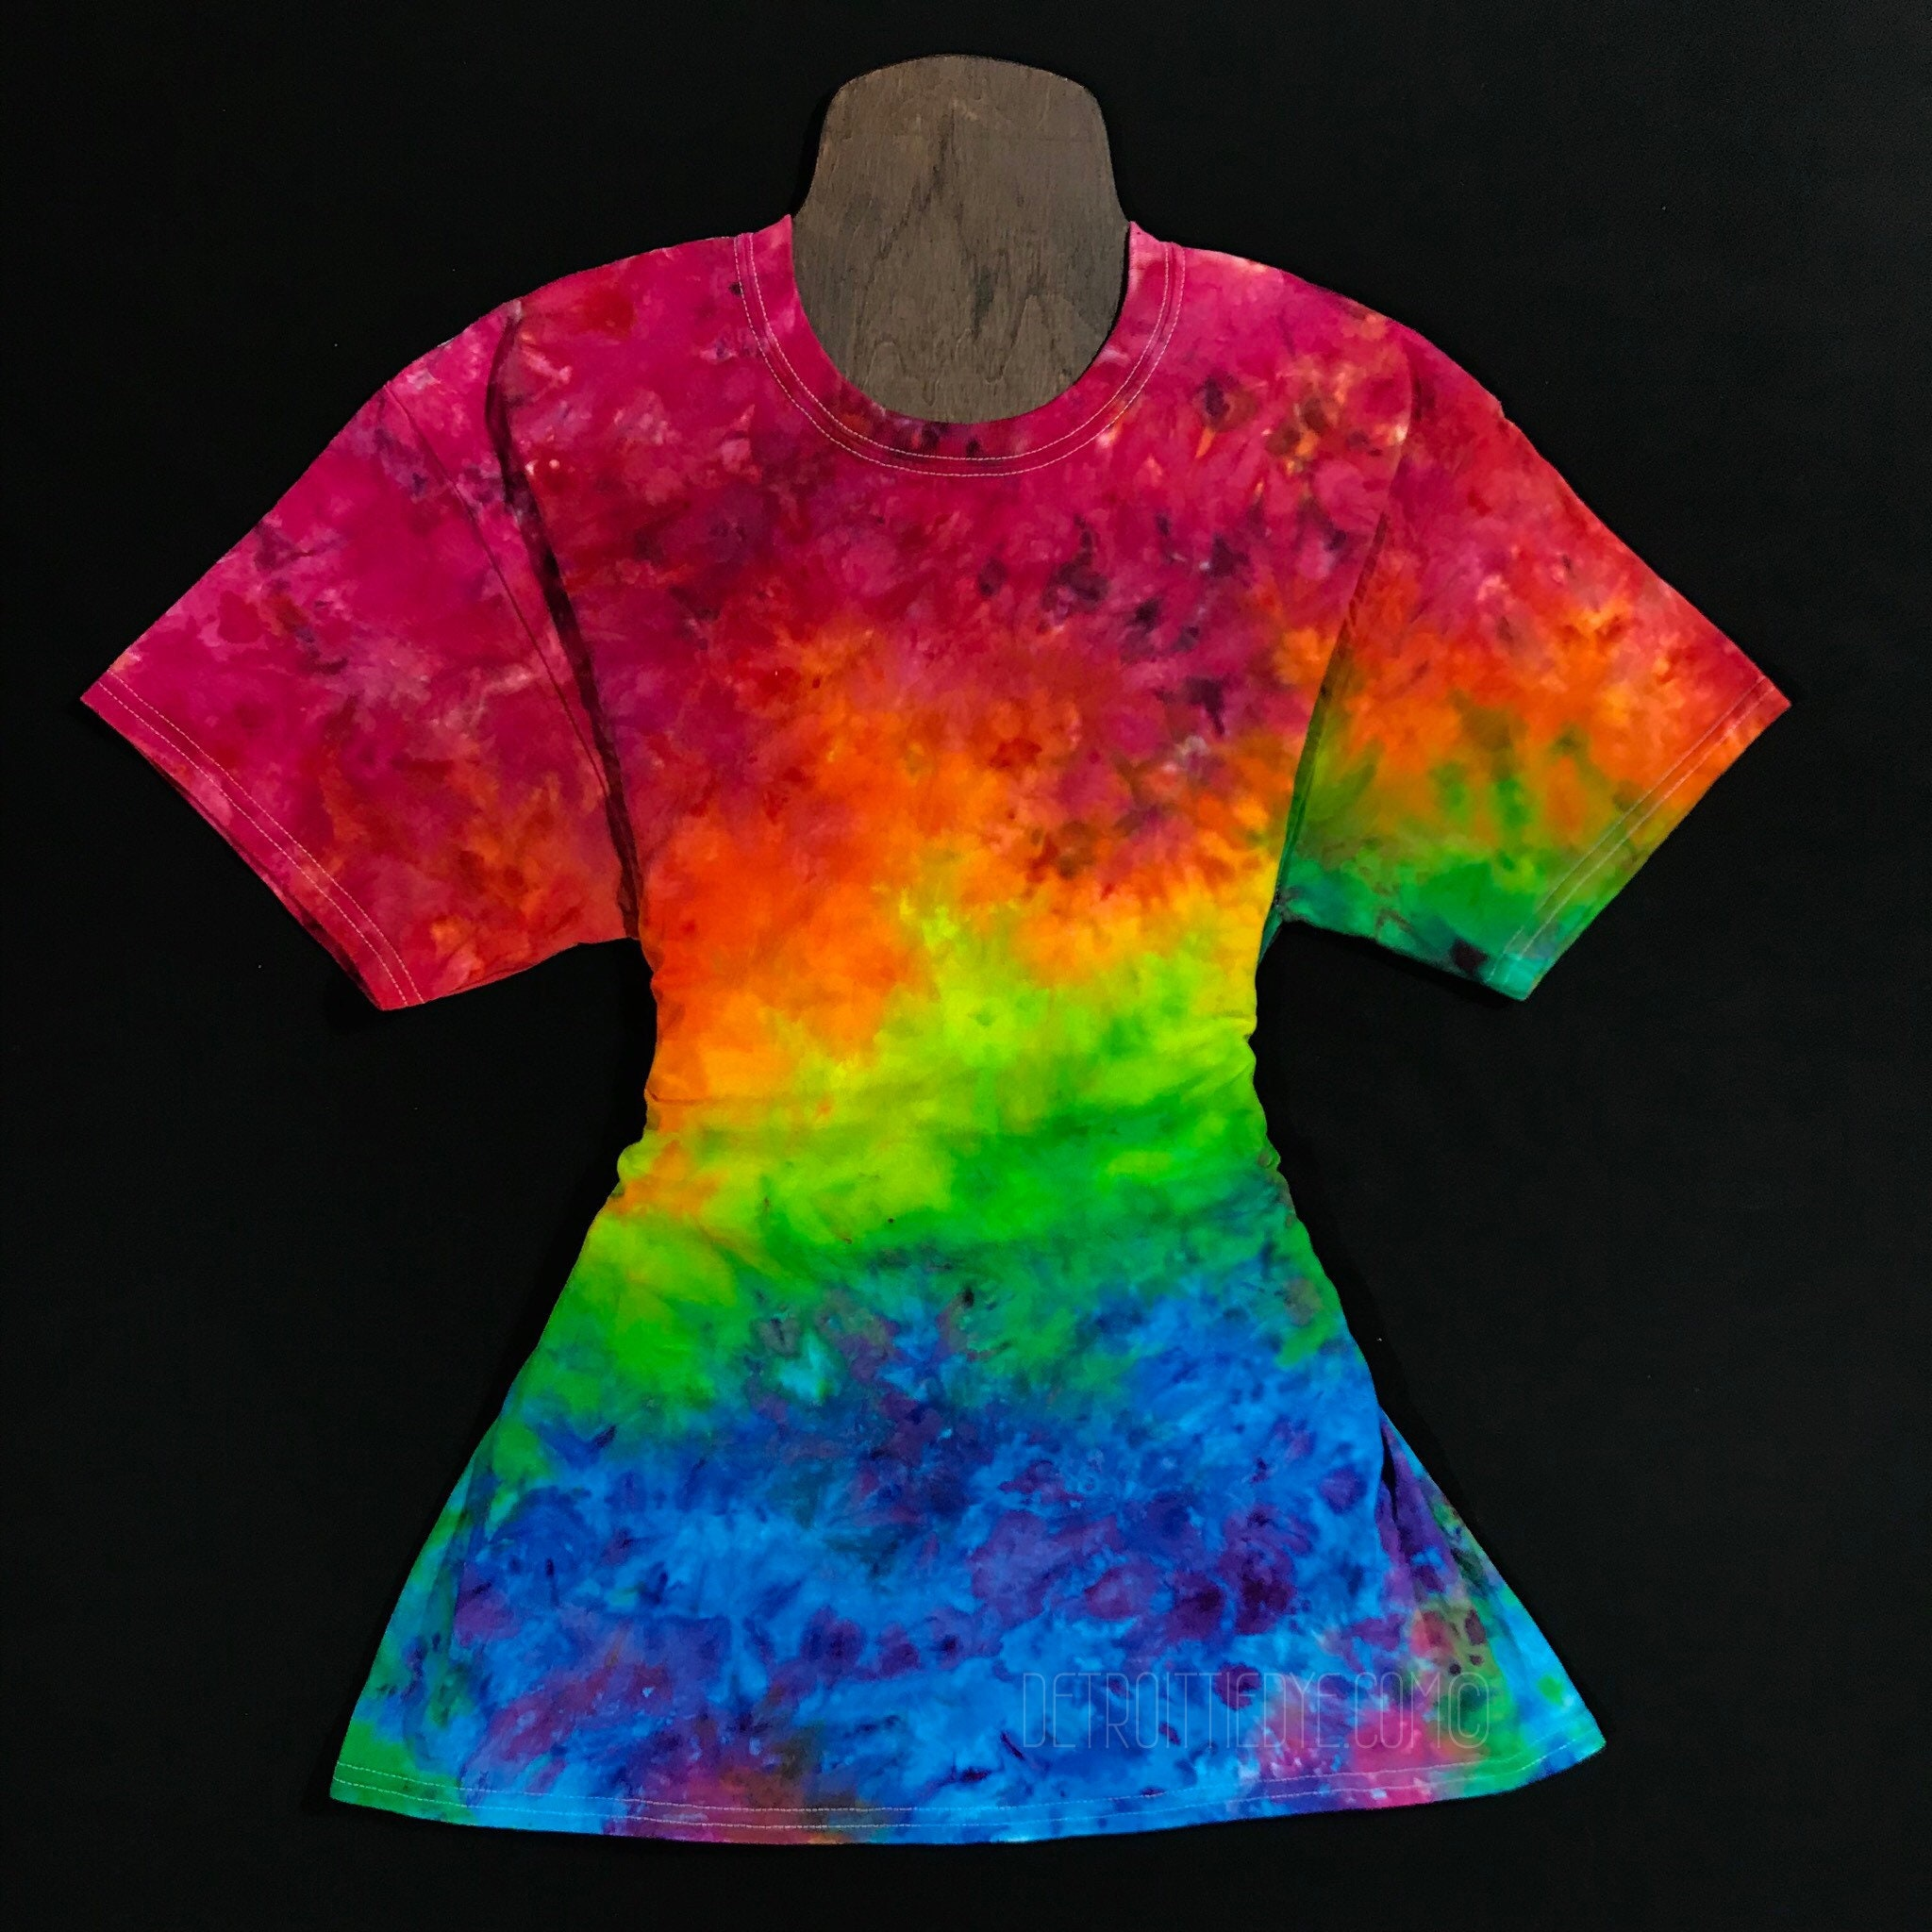 Rainbow Splatter Tie Dye Shirt Custom Made Tie Dye Ice Etsy